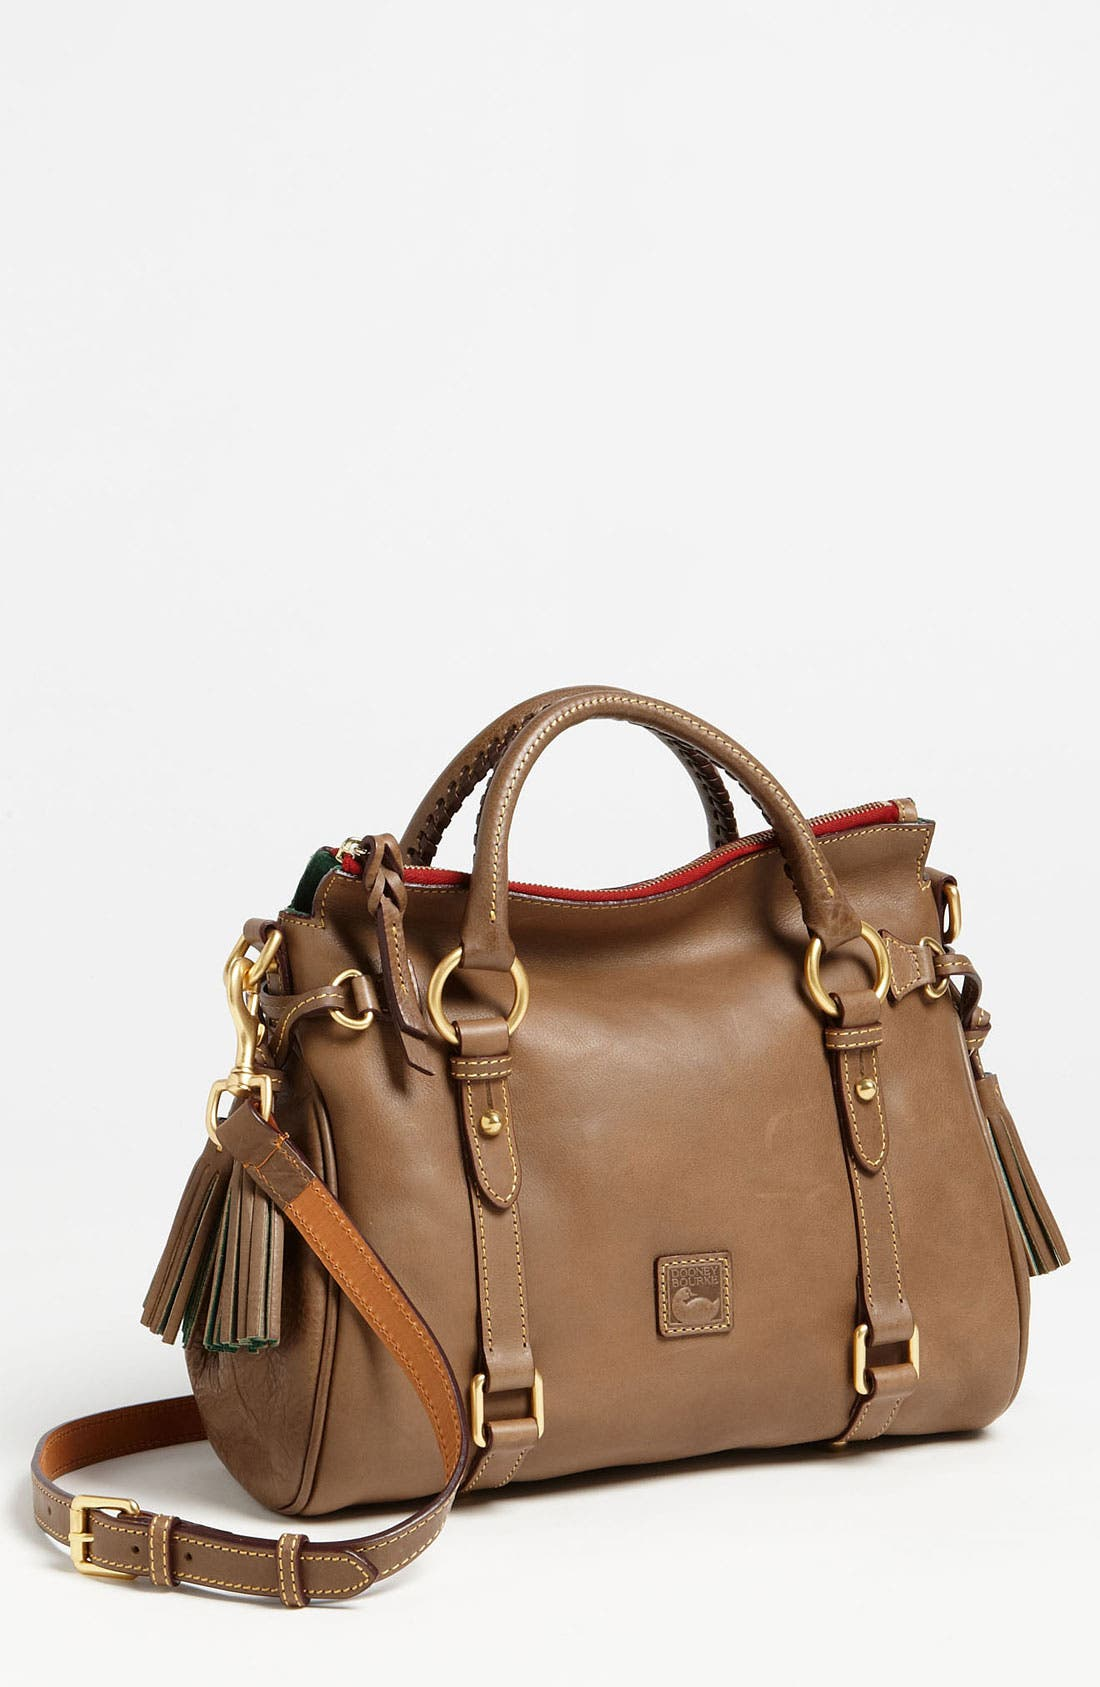 Alternate Image 1 Selected - Dooney & Bourke 'Florentine - Small' Leather Crossbody Satchel